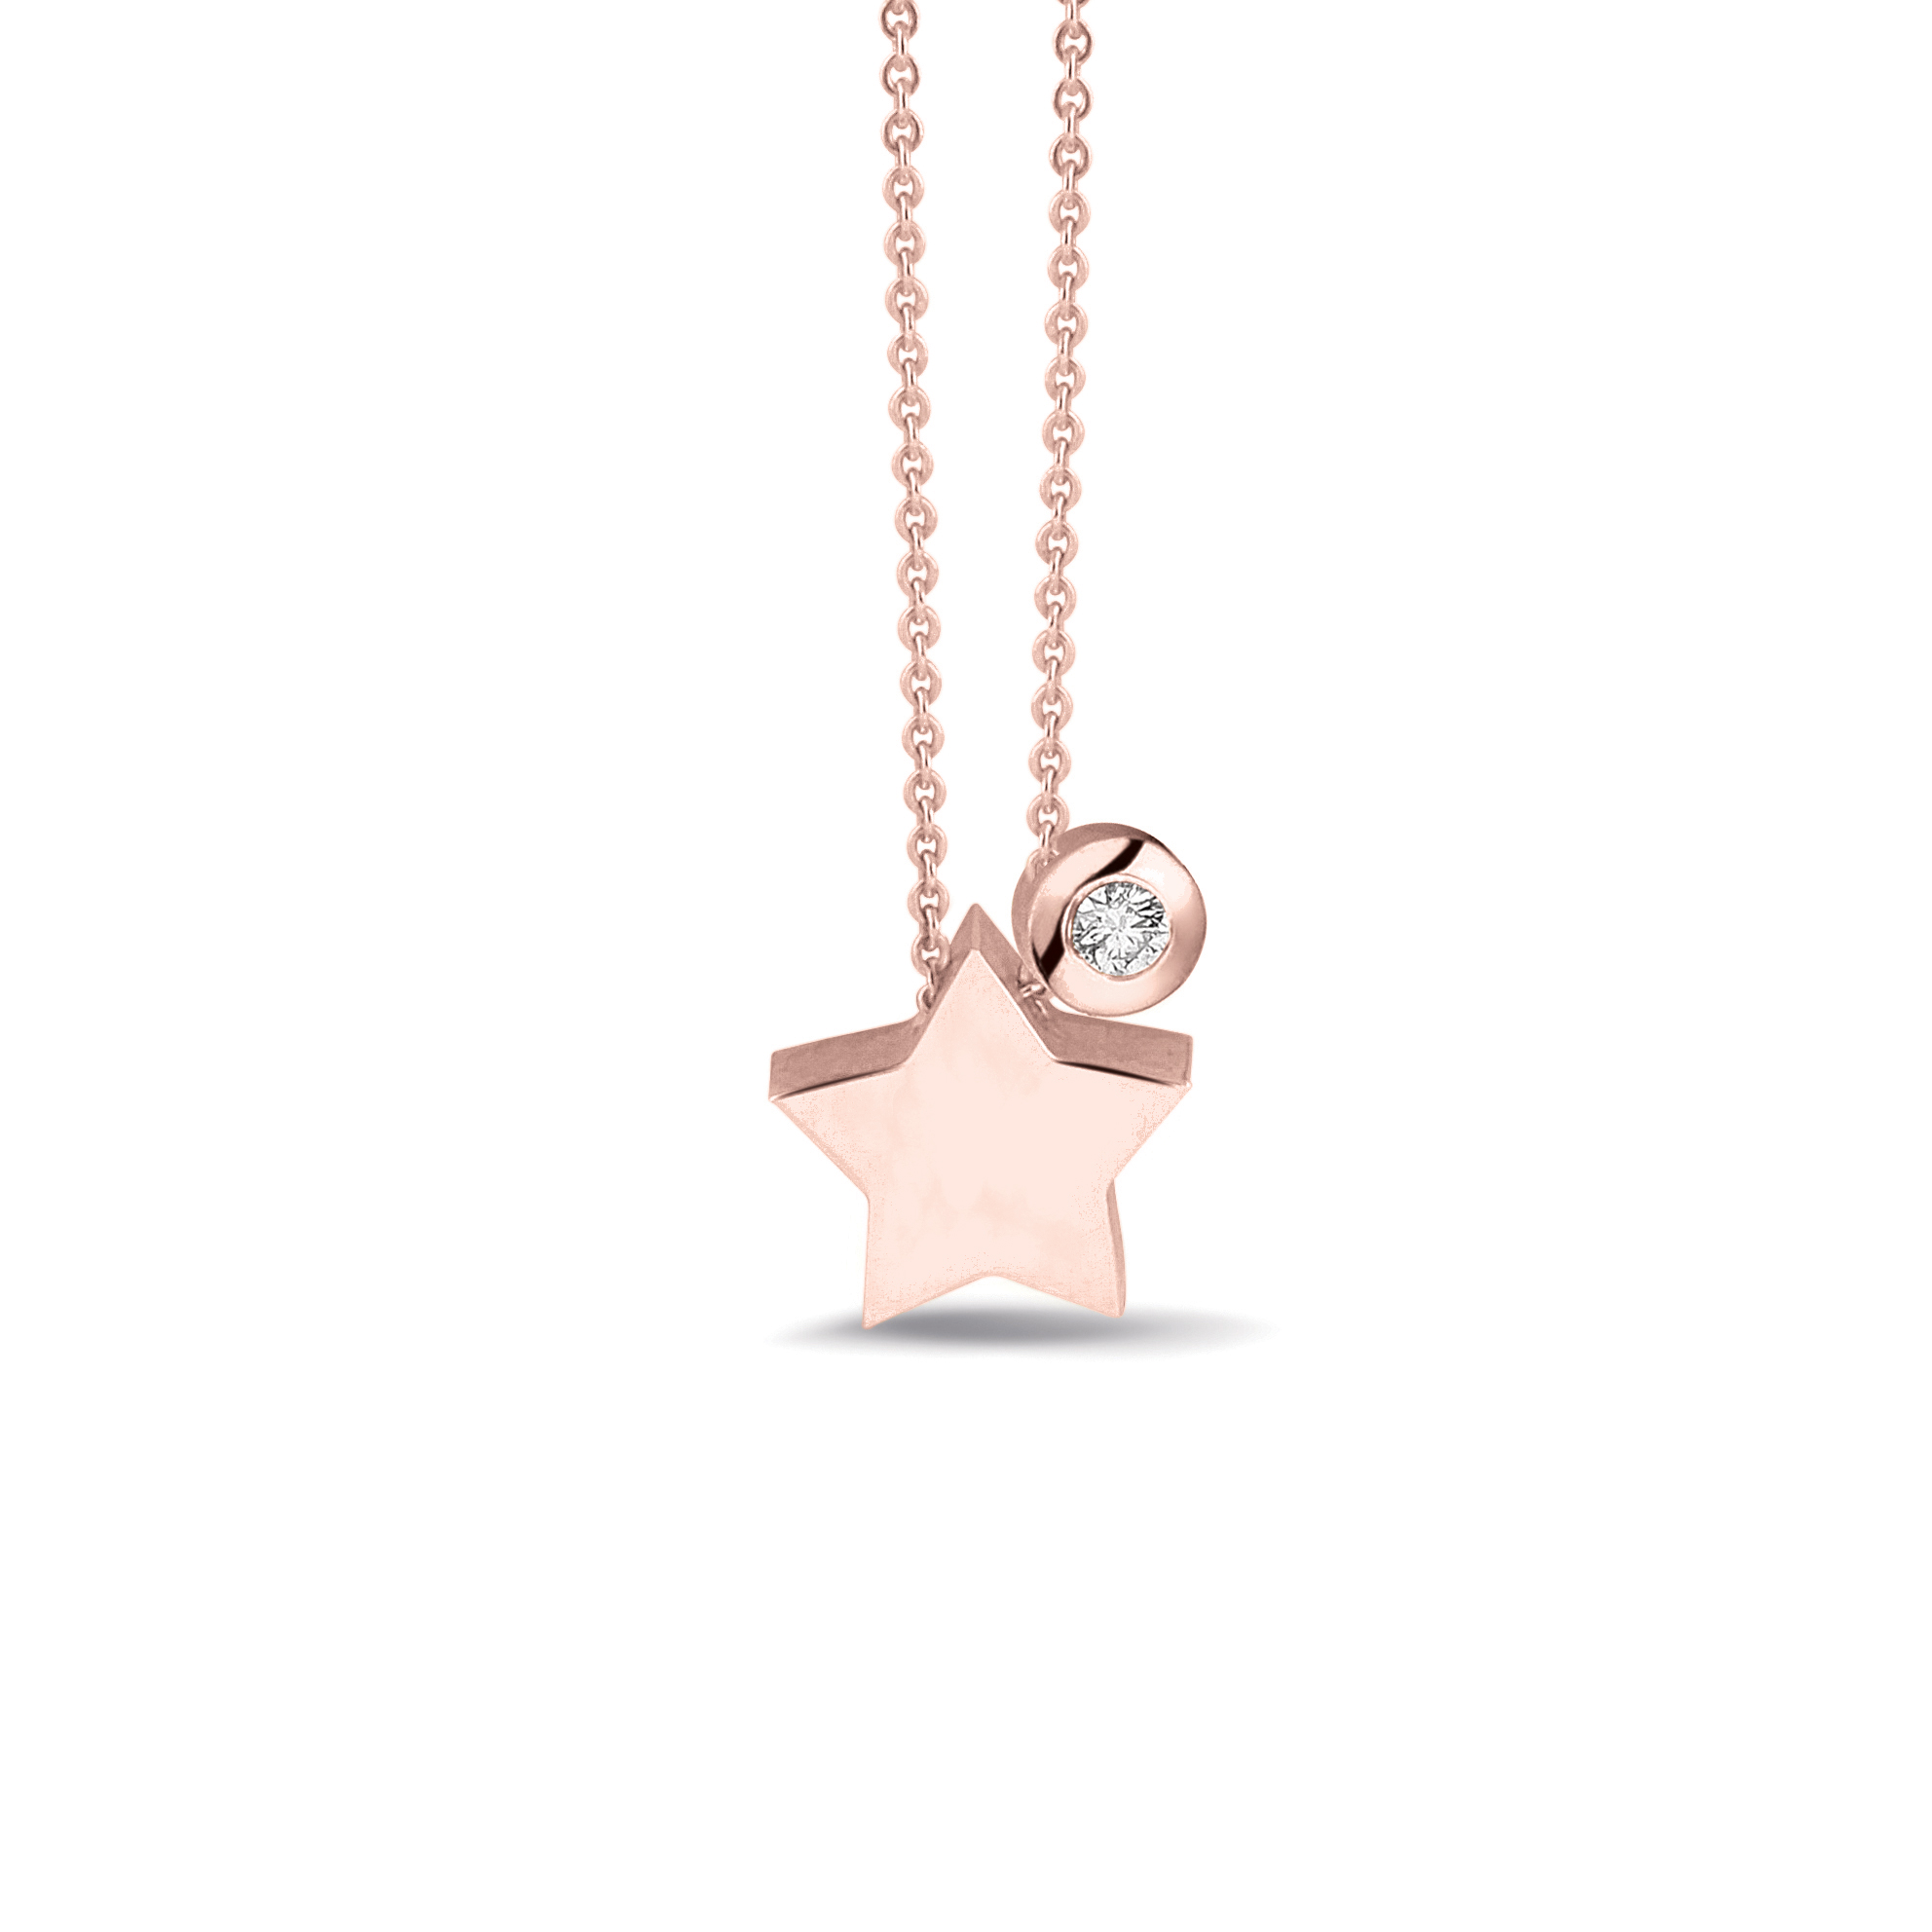 ster hanger 702 R Goud + 707 R Diamant